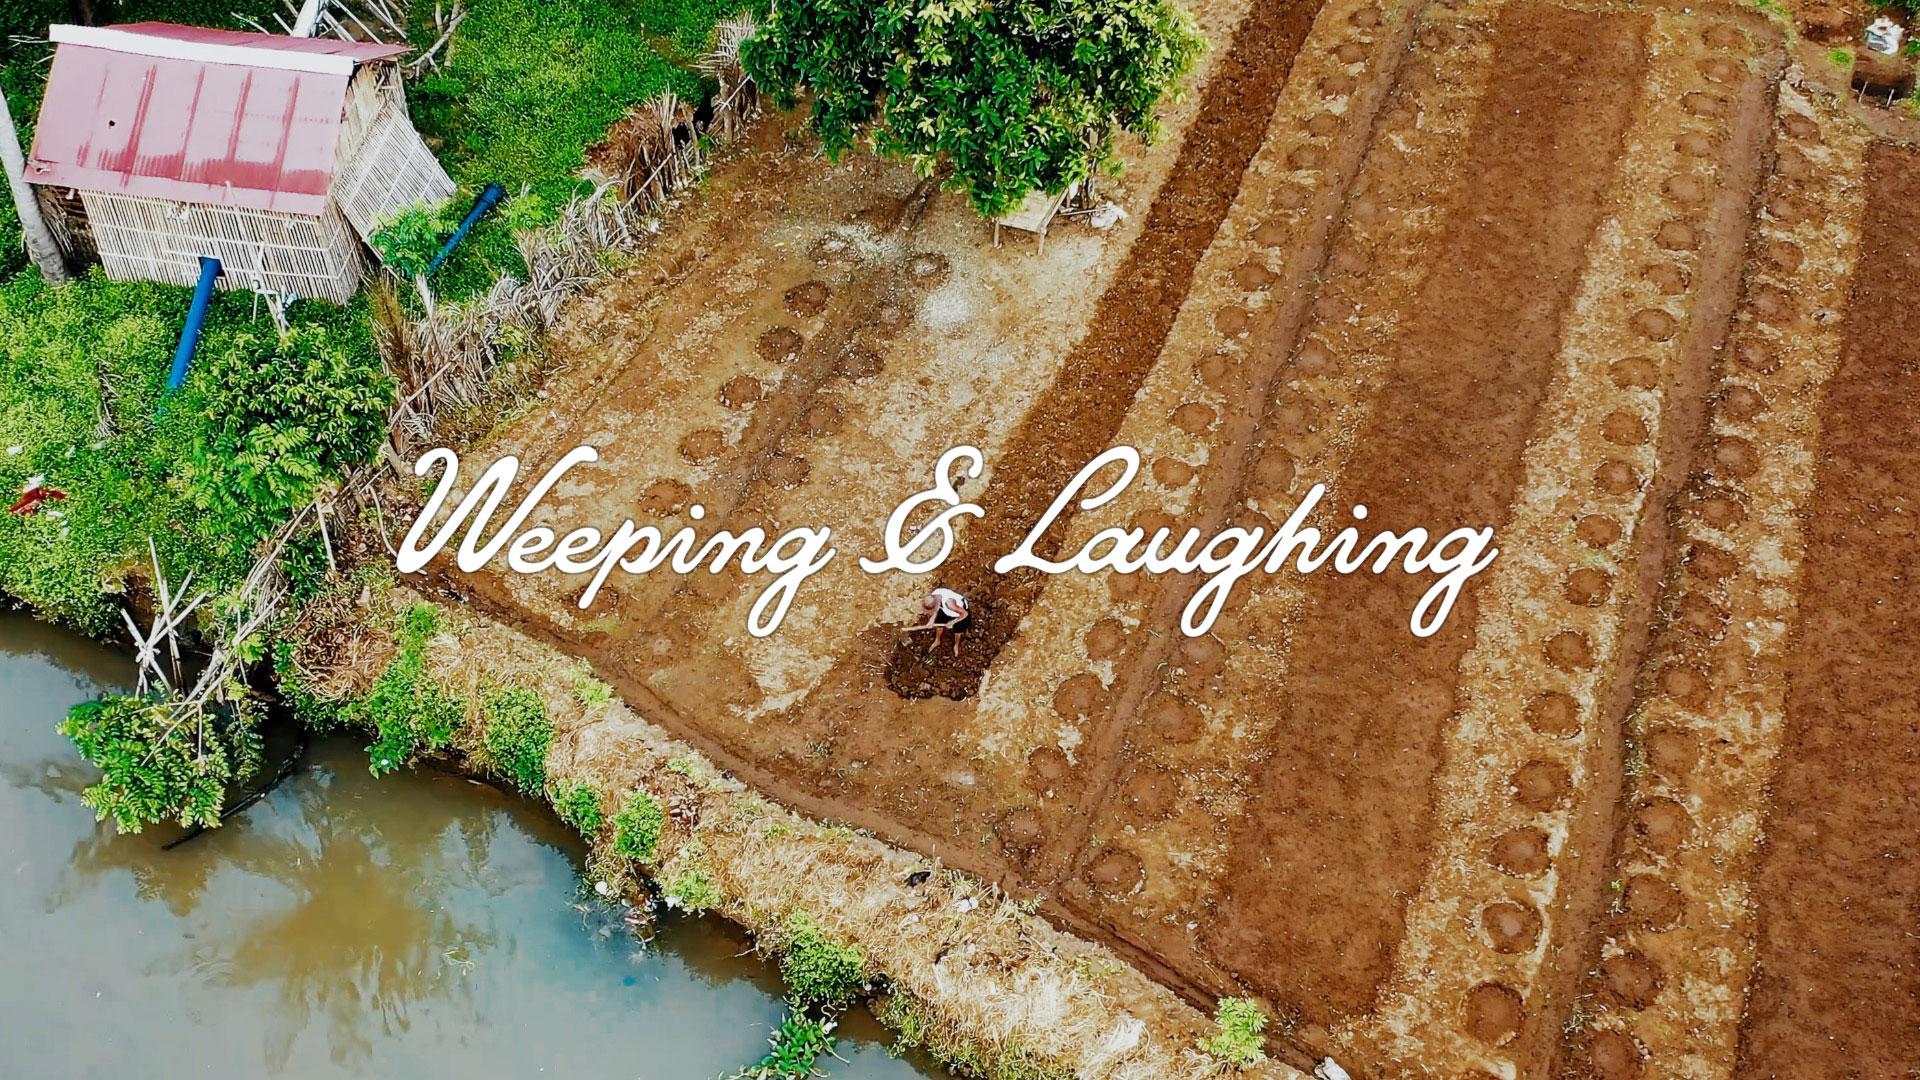 Series: Weeping & Laughing